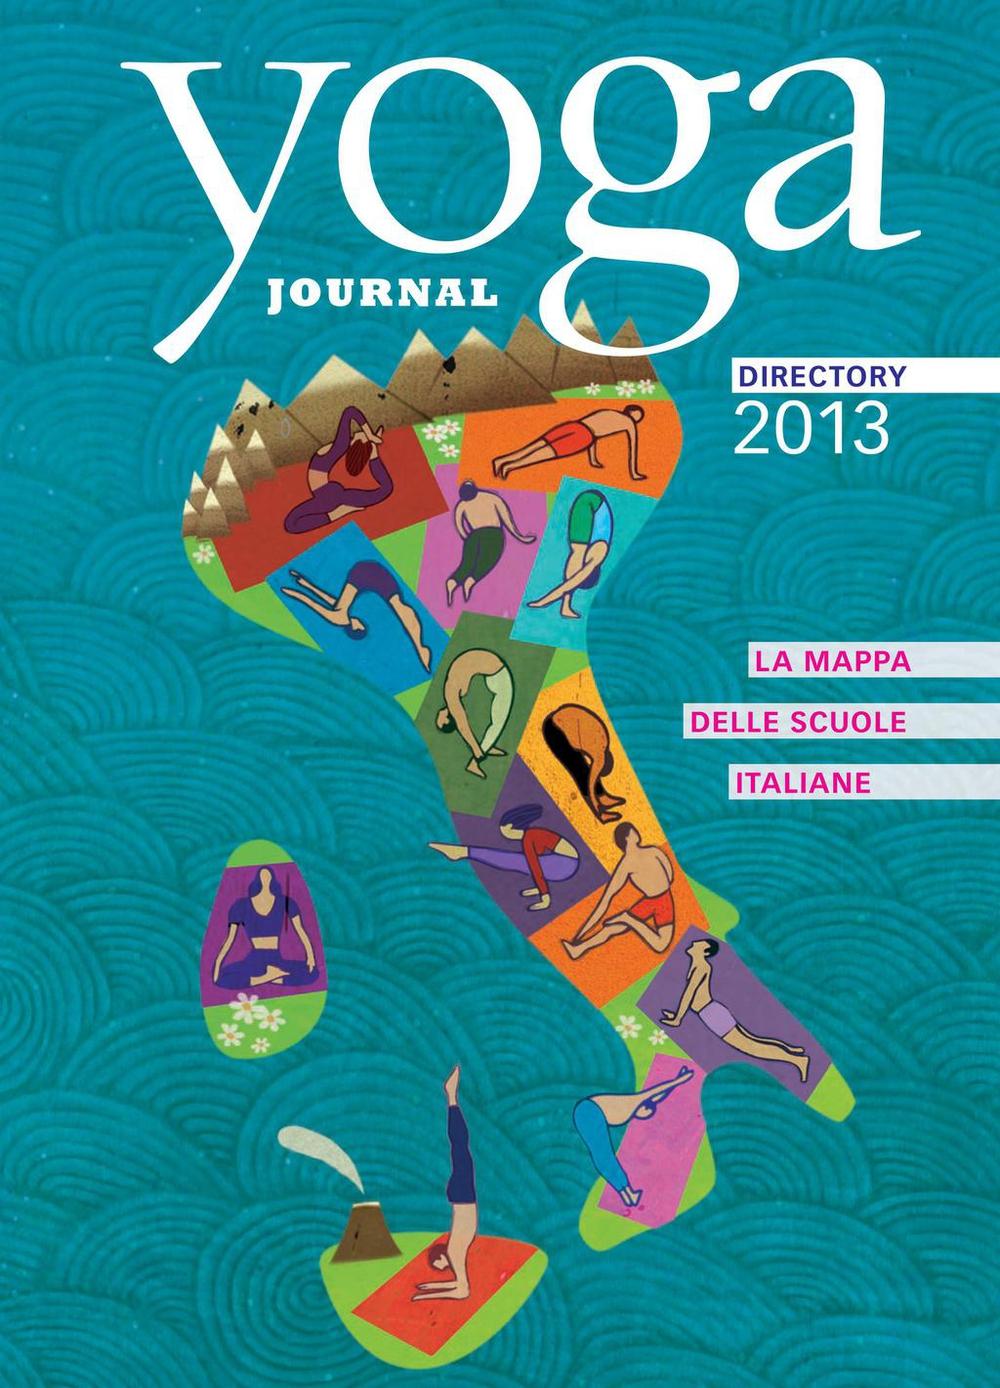 Yoga Journal Directory Scuole 2013